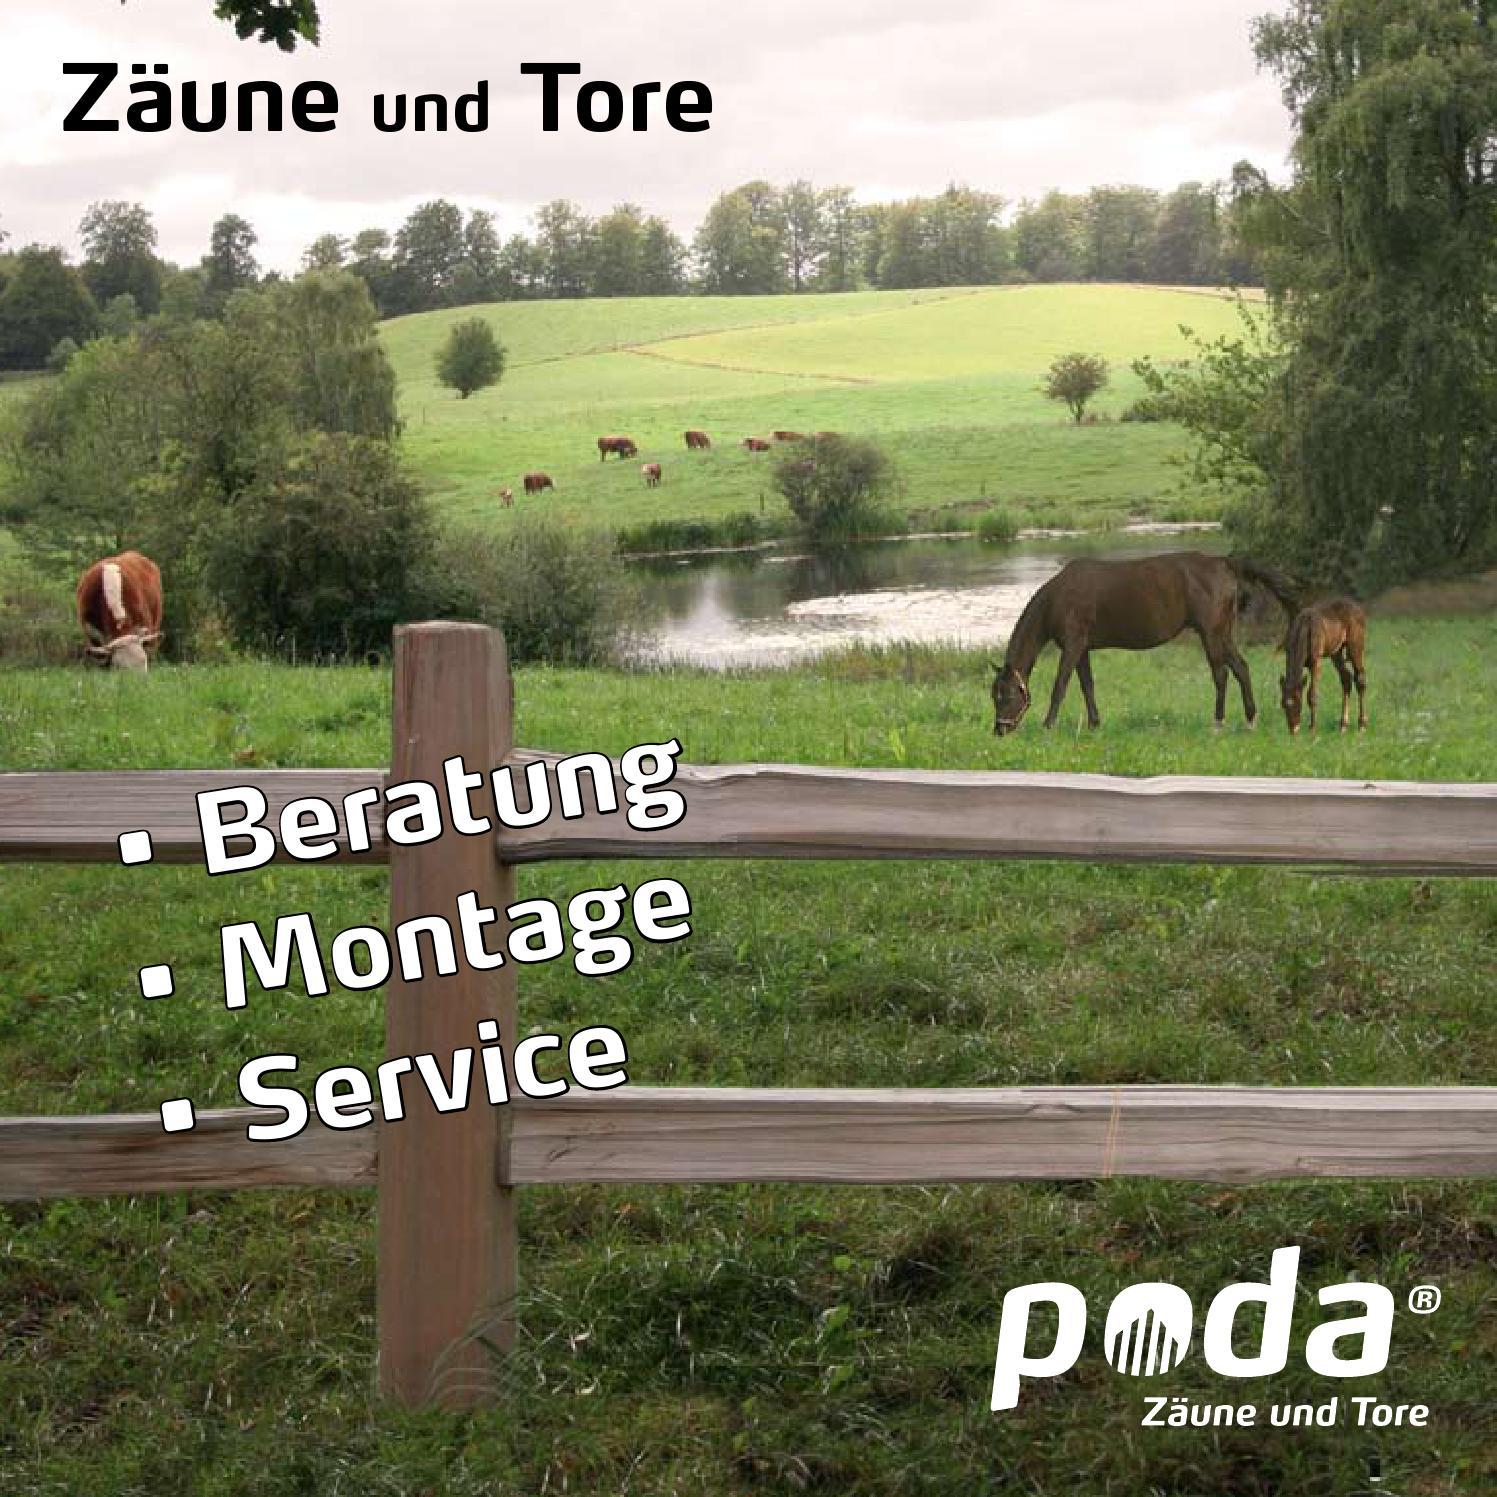 Poda Zaun Center Bad Oeynhausen by Matthias M. Pook - issuu